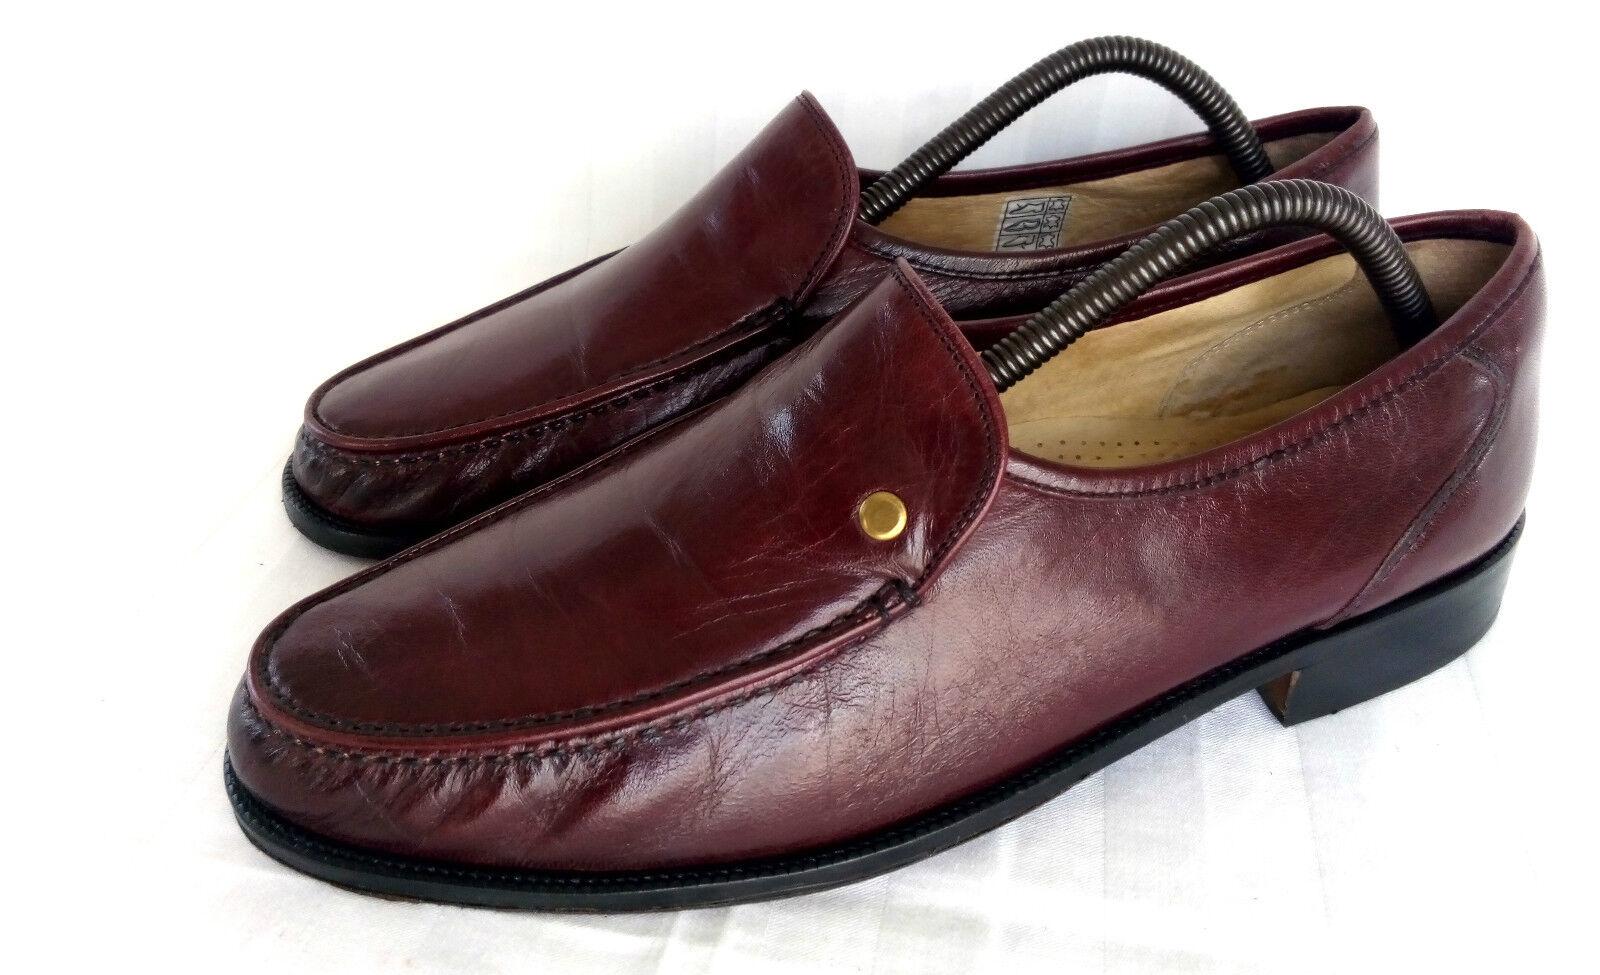 Dino Romani Elegante Loafer Slipper Apron Toe Burgundy Oxblood NAPPA Leder 43,5